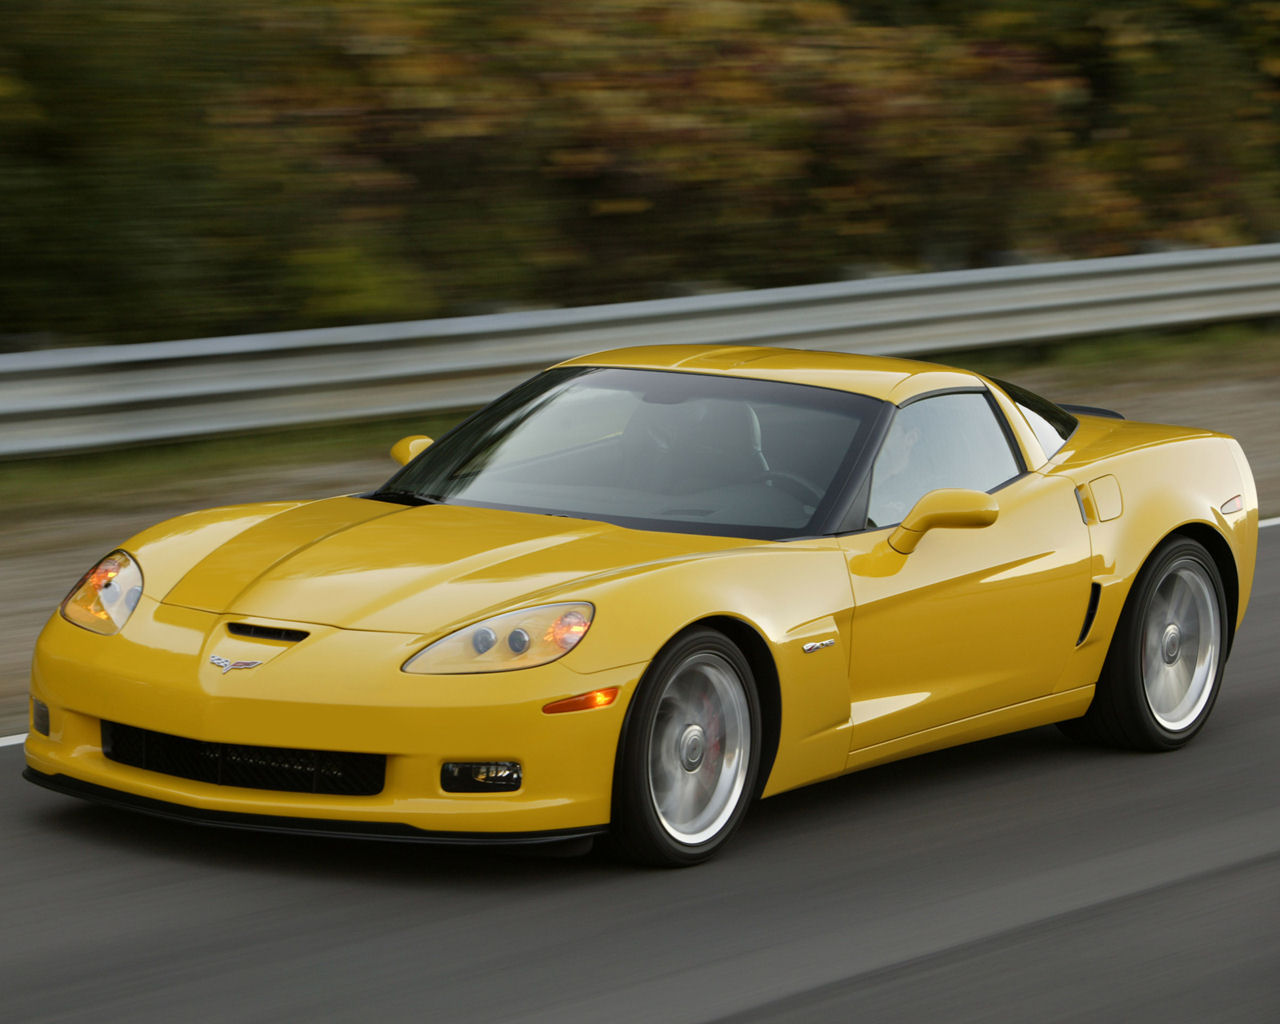 Corvette Convertible Z06 ZR1 Chevy   1280x1024 Wallpaper 1280x1024